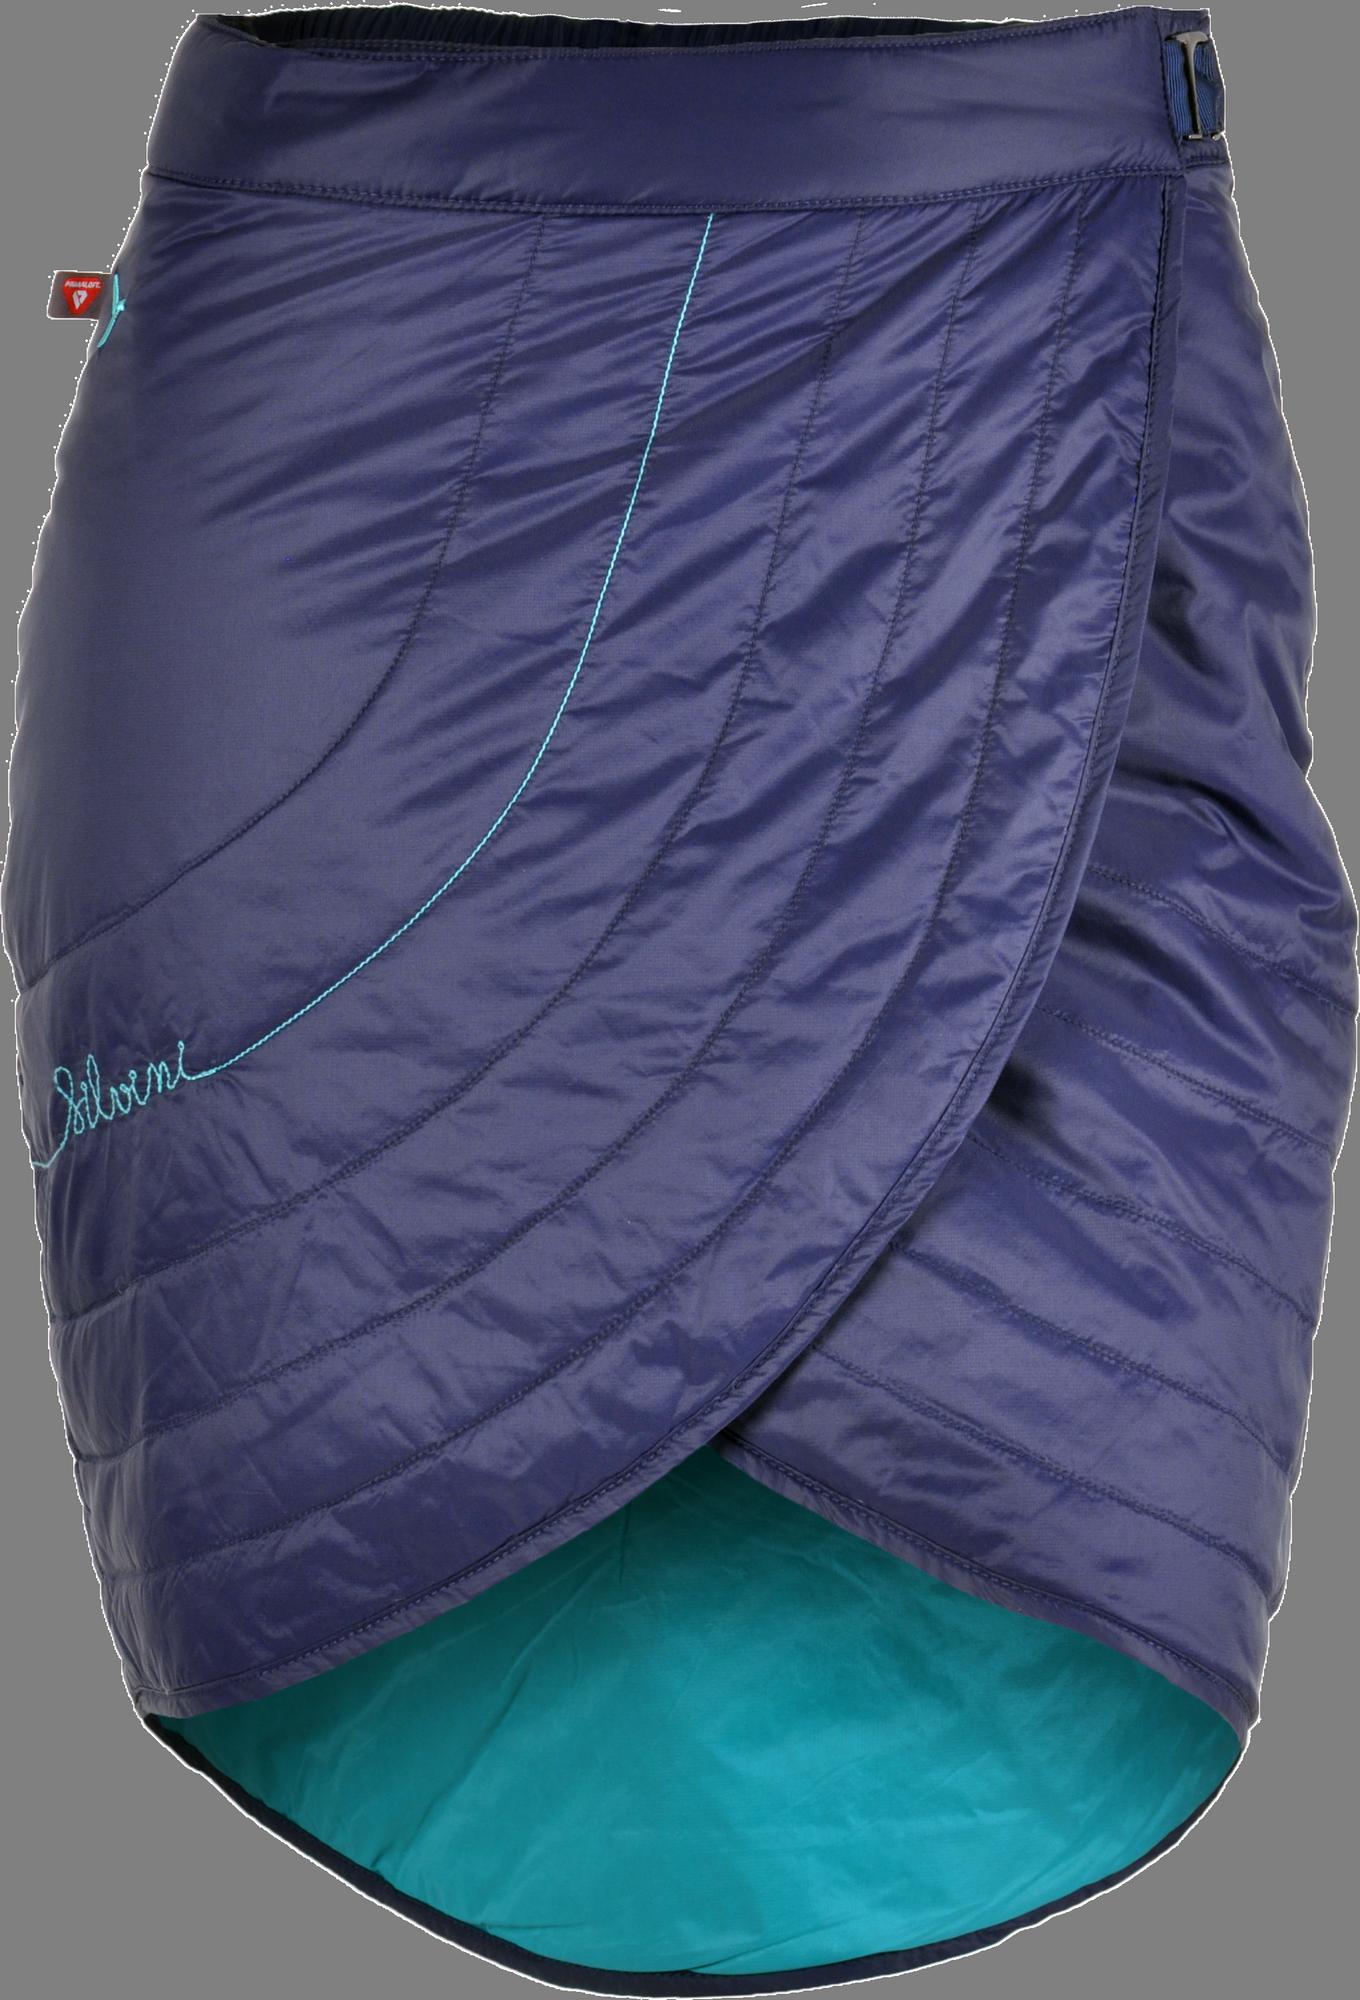 6feb253a478e Silvini Ballone WS1106 dámska prevleková sukňa navy-turquoise